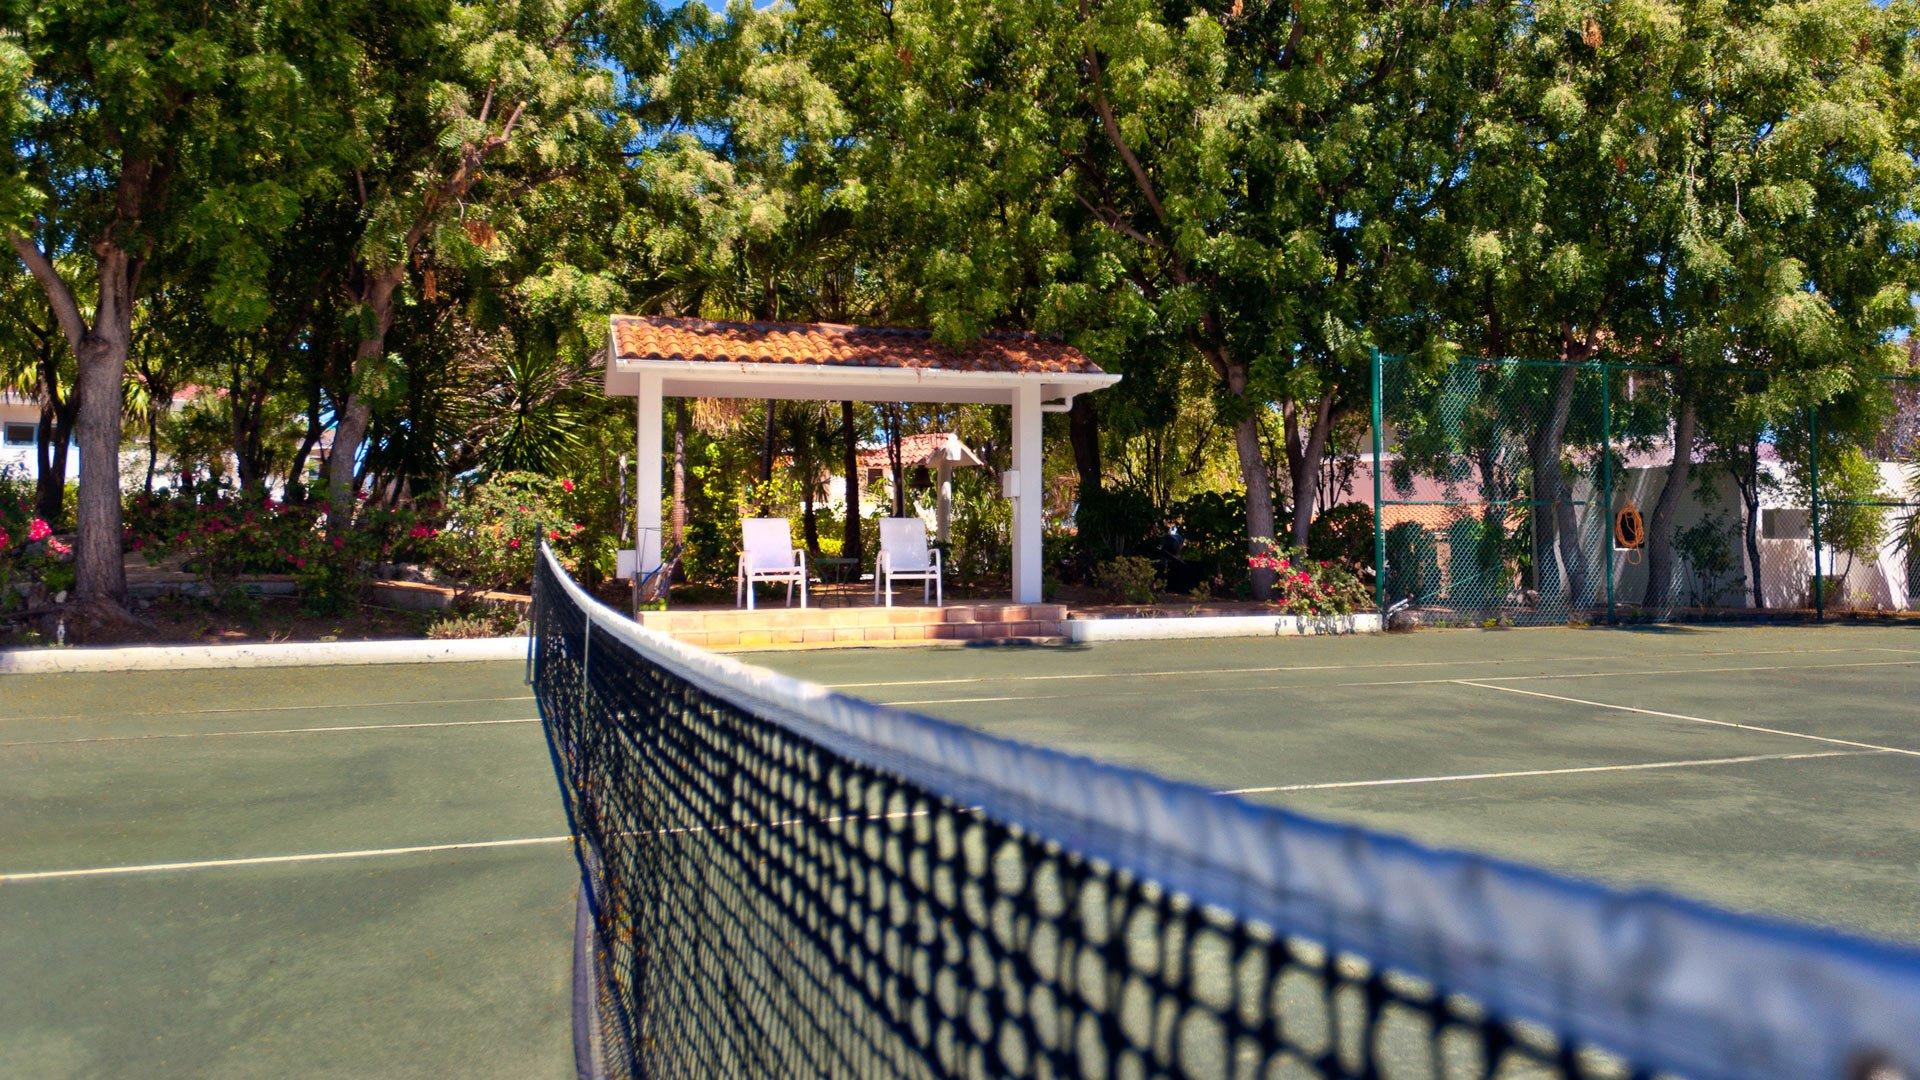 Zenaida tennis gazebo